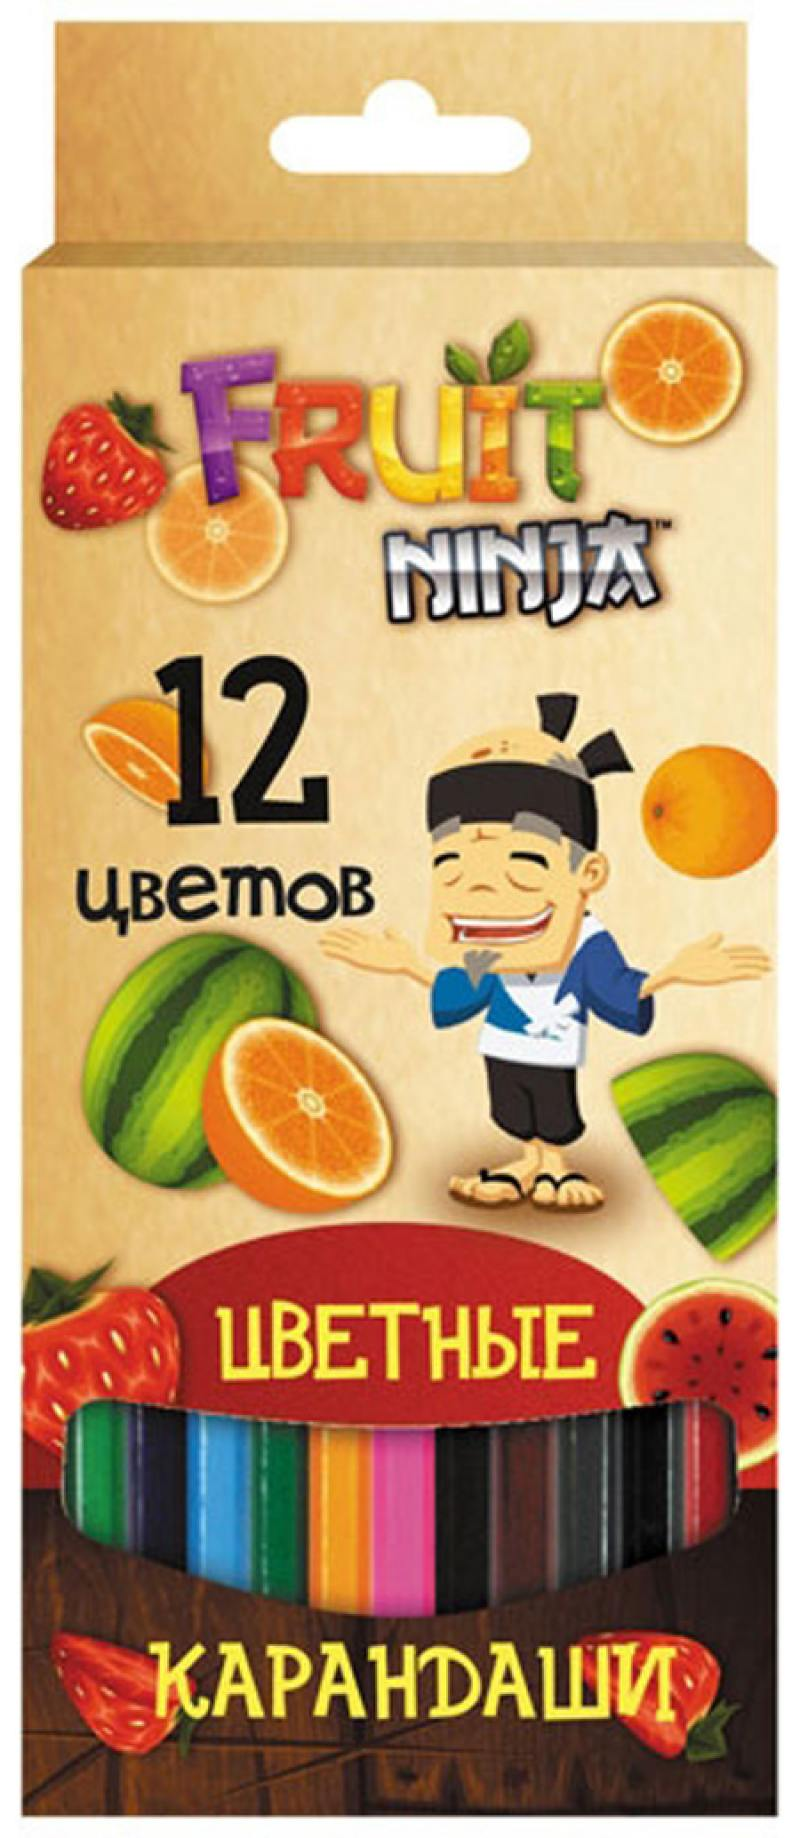 Набор цветных карандашей Action! Fruit Ninja 12 шт FN-ACP205-12 FN-ACP205-12 набор цветных карандашей action fruit ninja 12 шт fn acp205 12 fn acp205 12